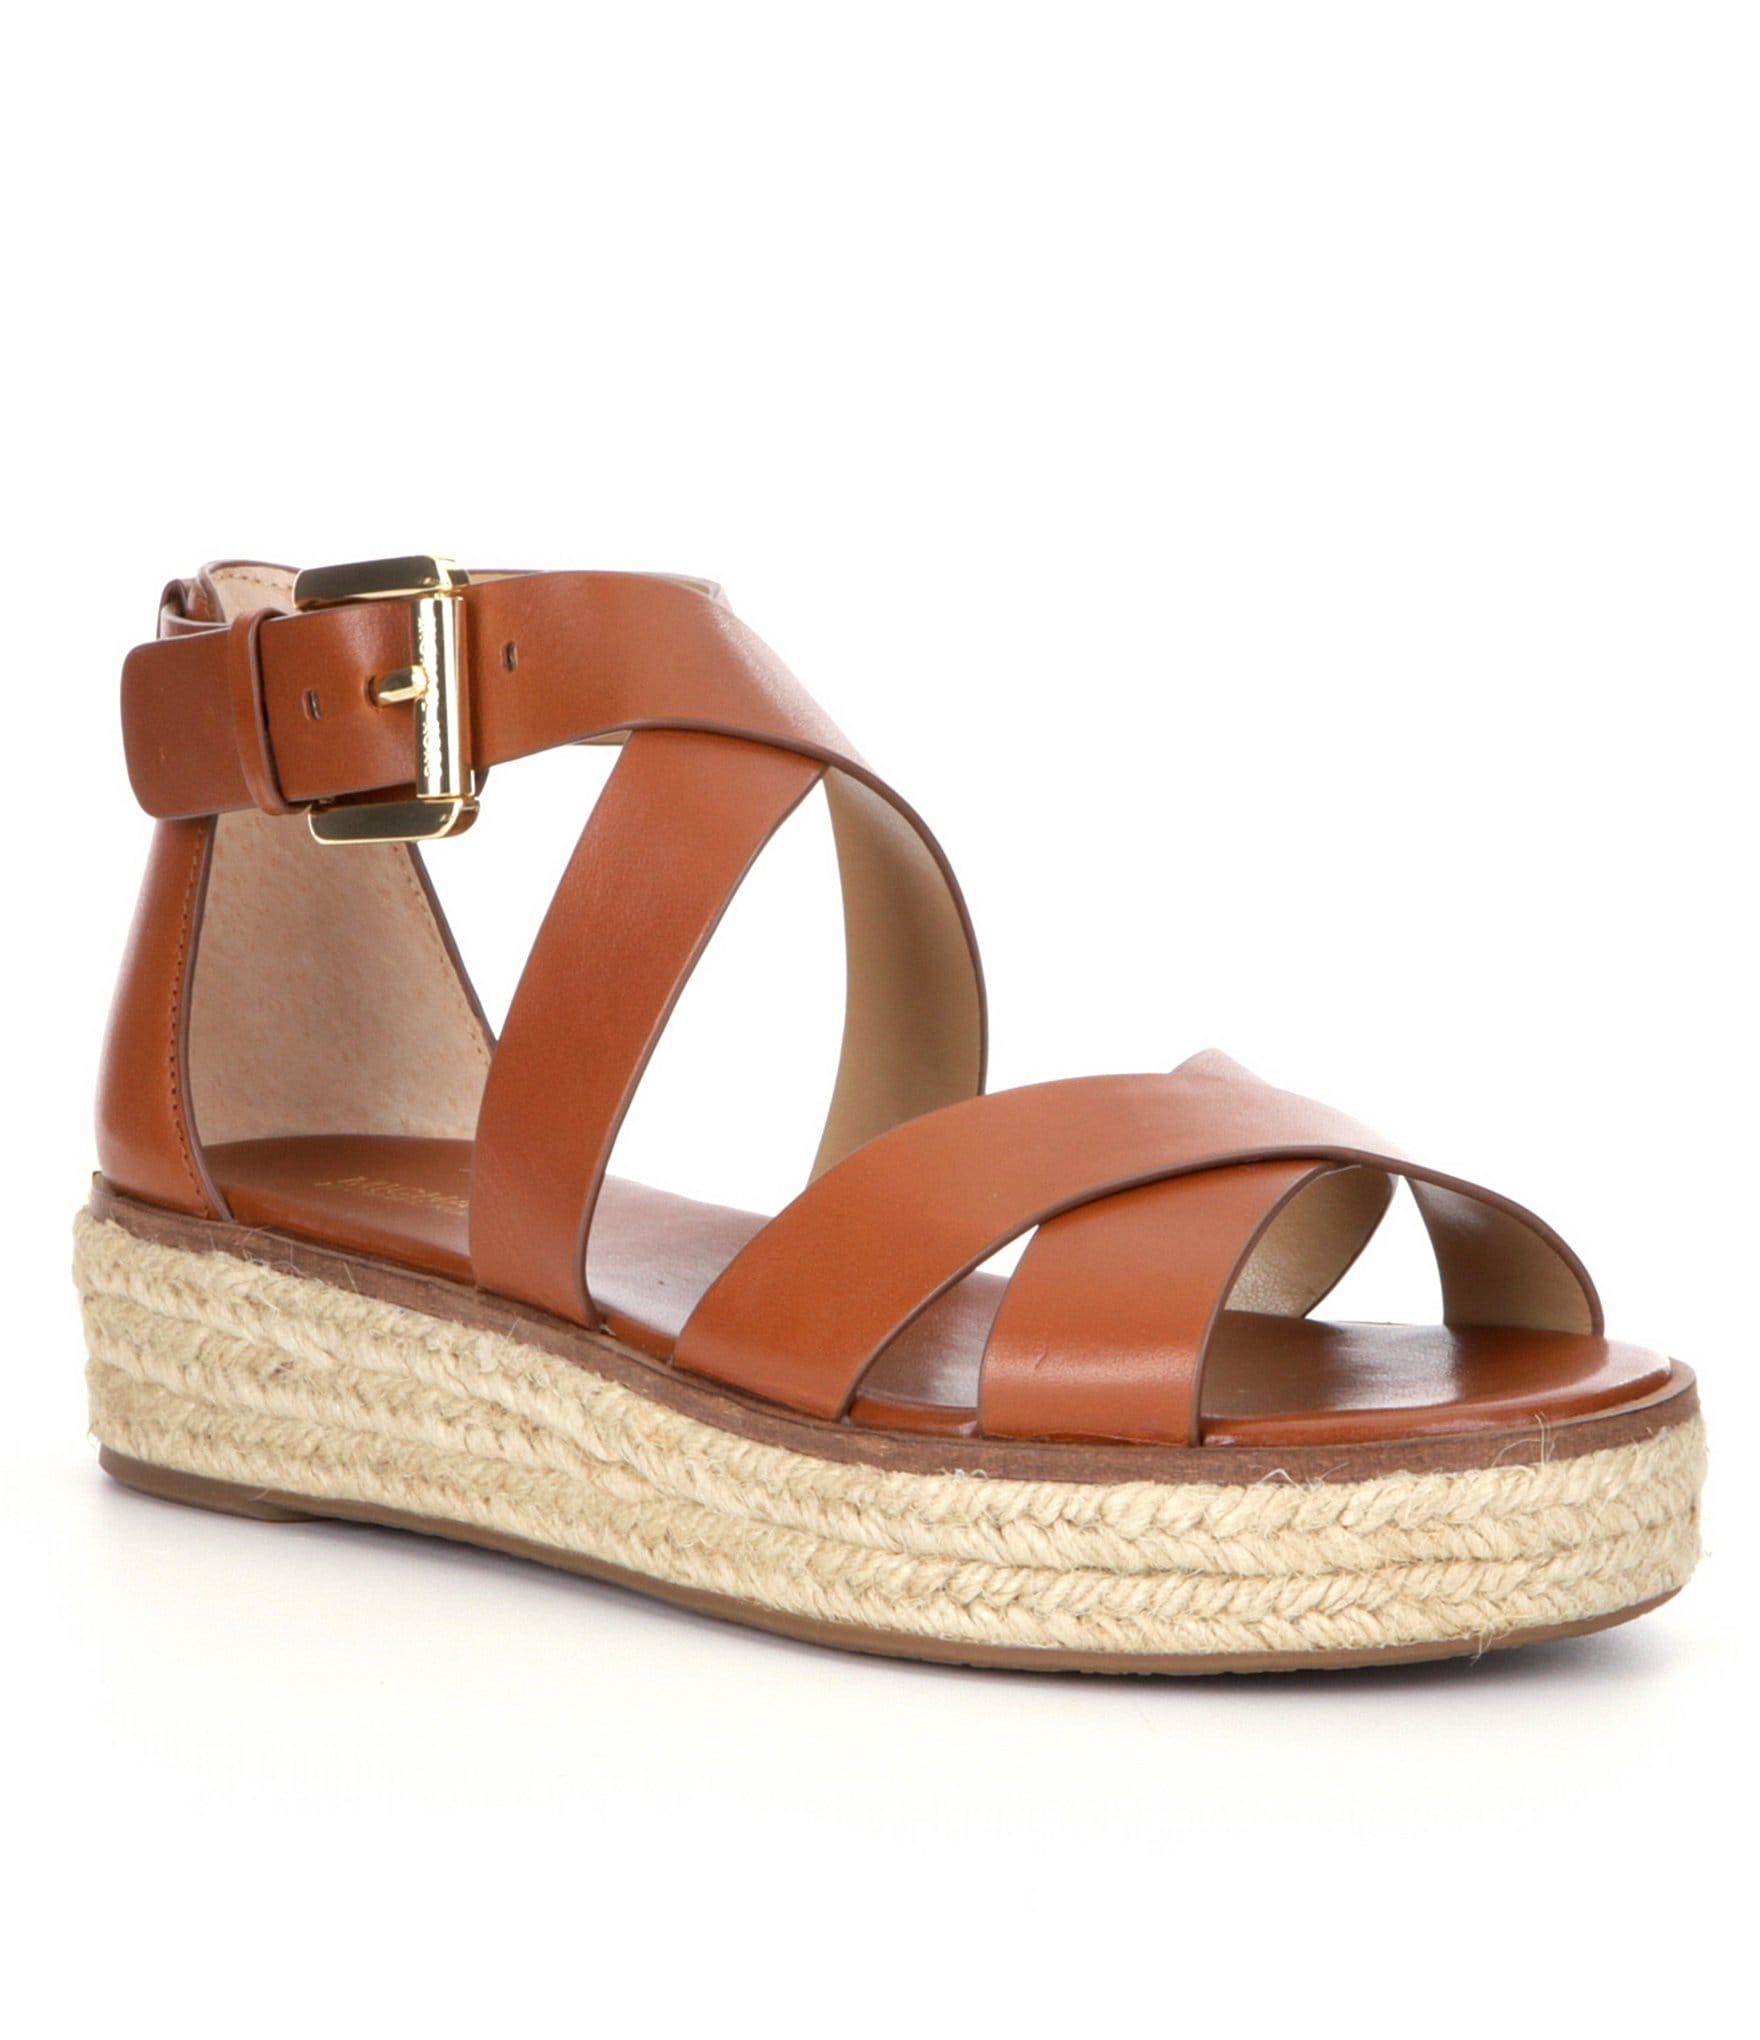 602b64dbb591 Buy michael kors loafers womens orange   OFF62% Discounted